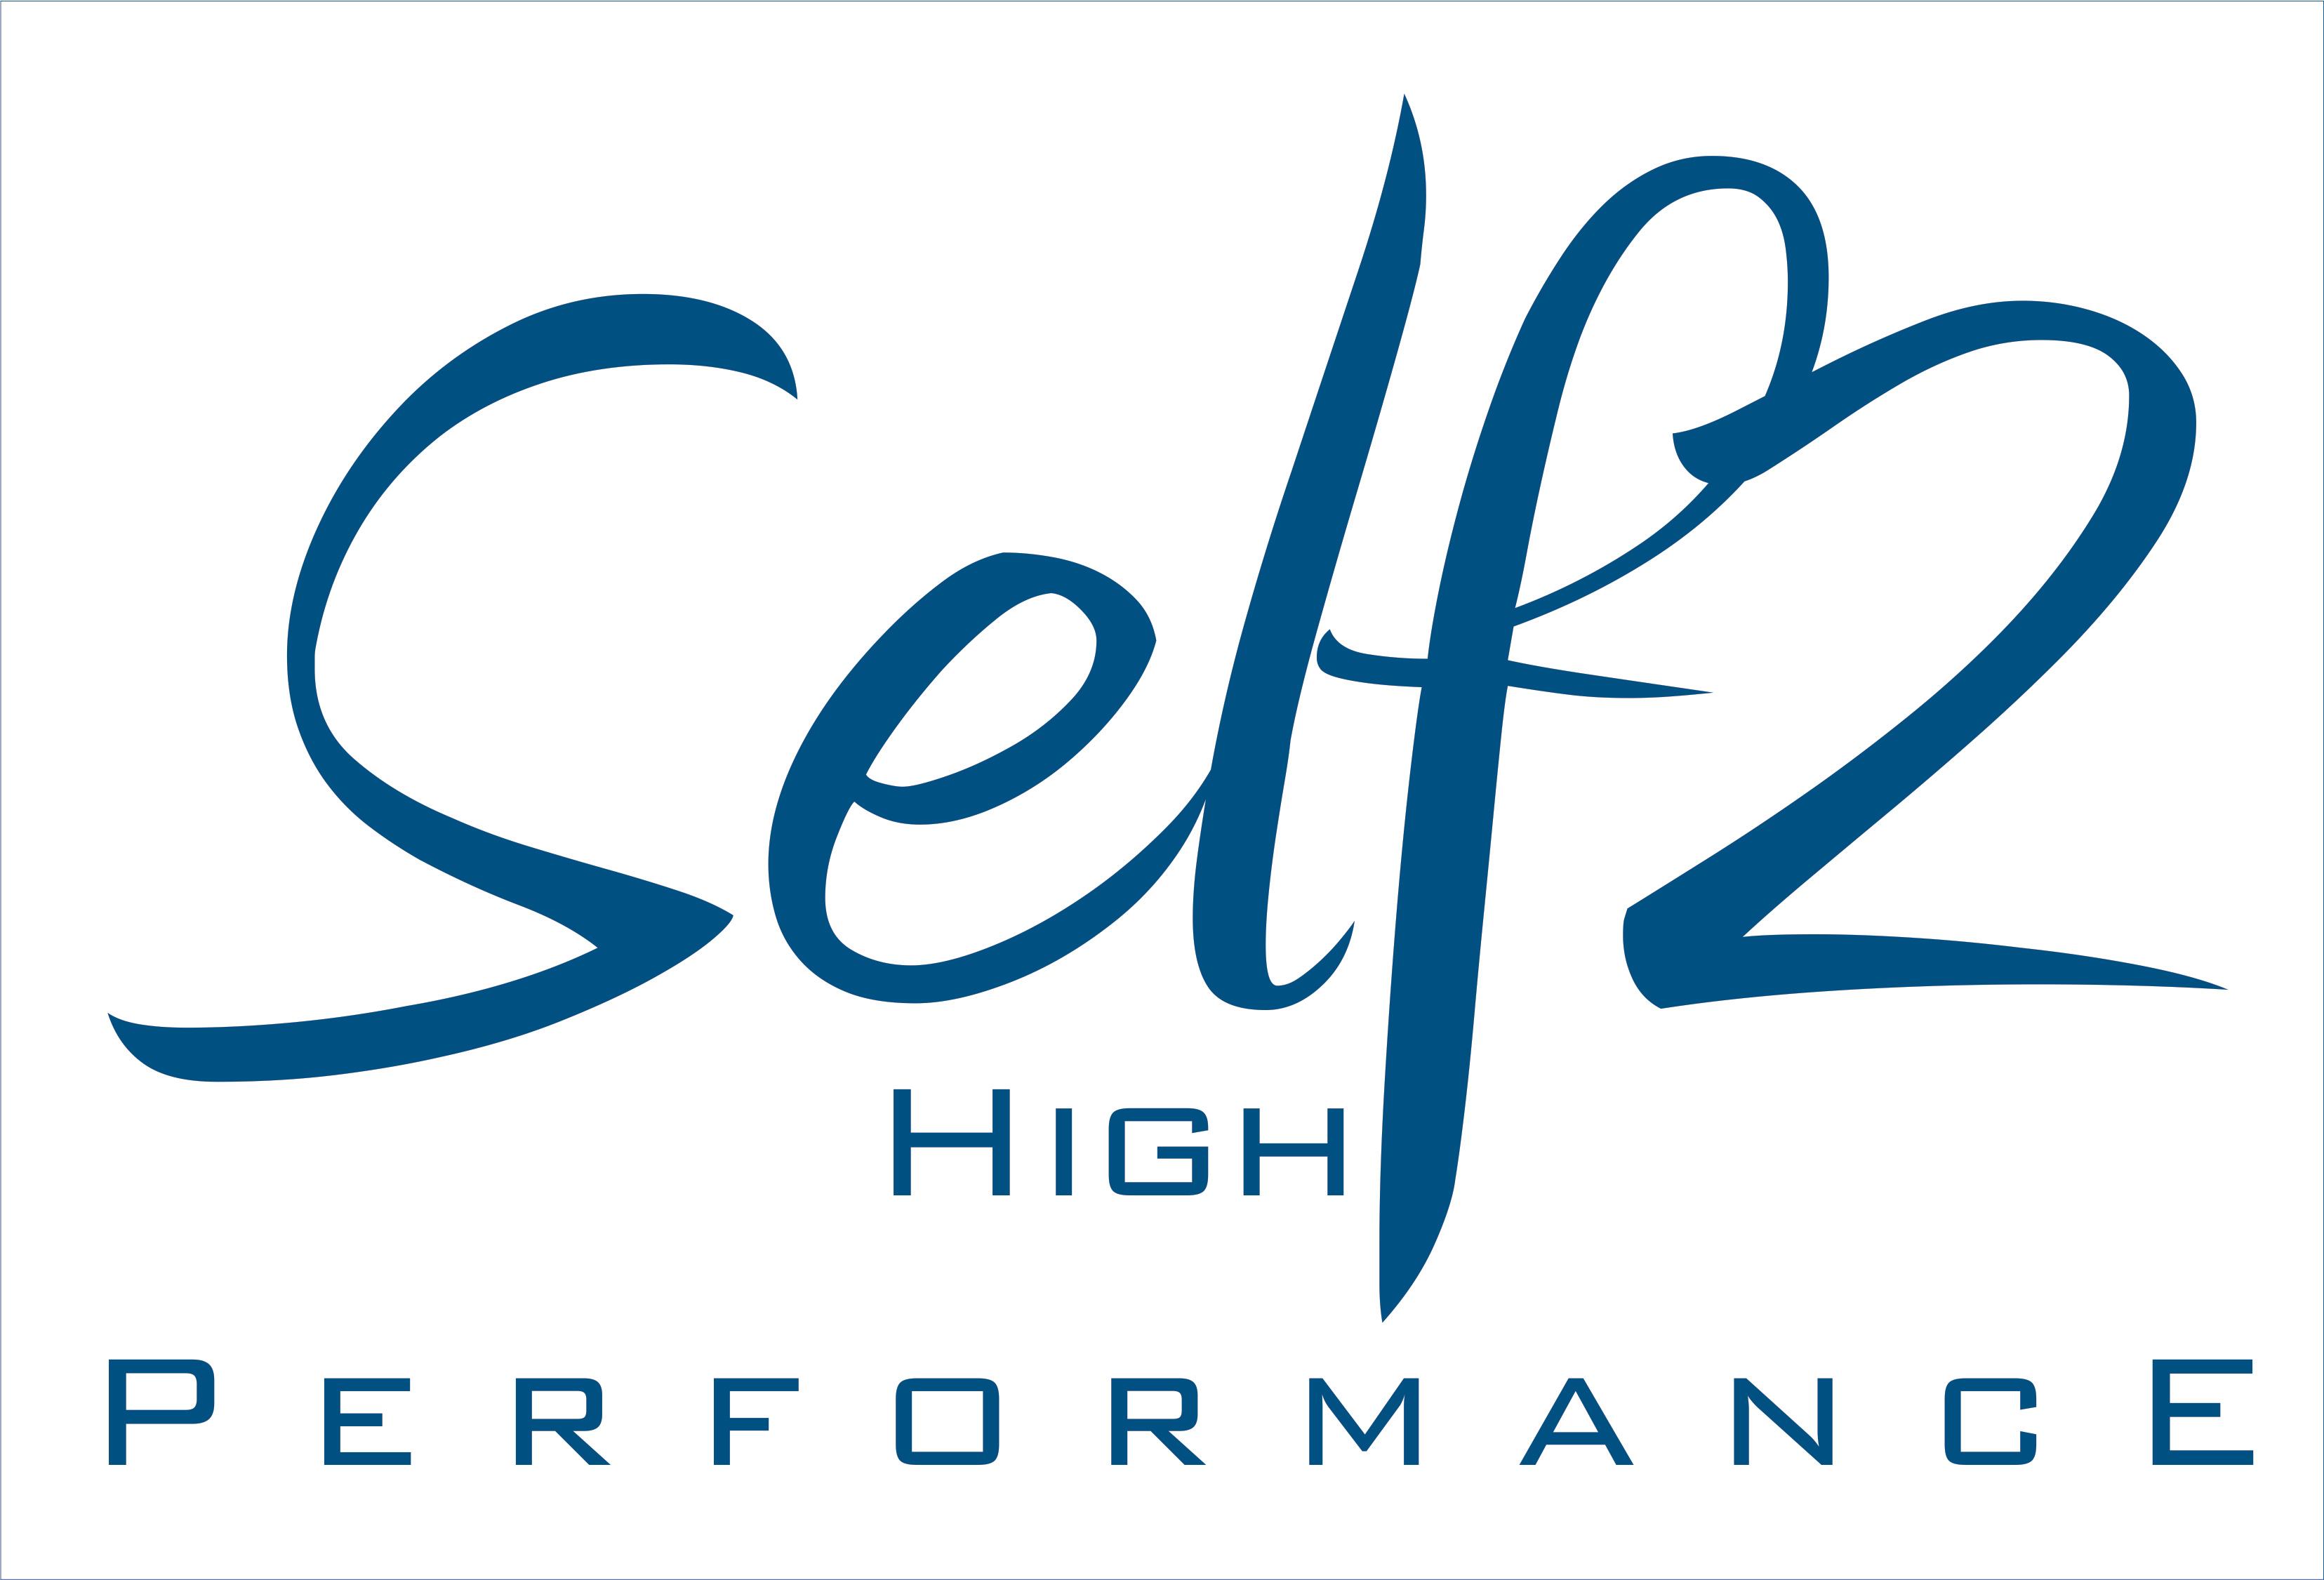 Self2 High Performance